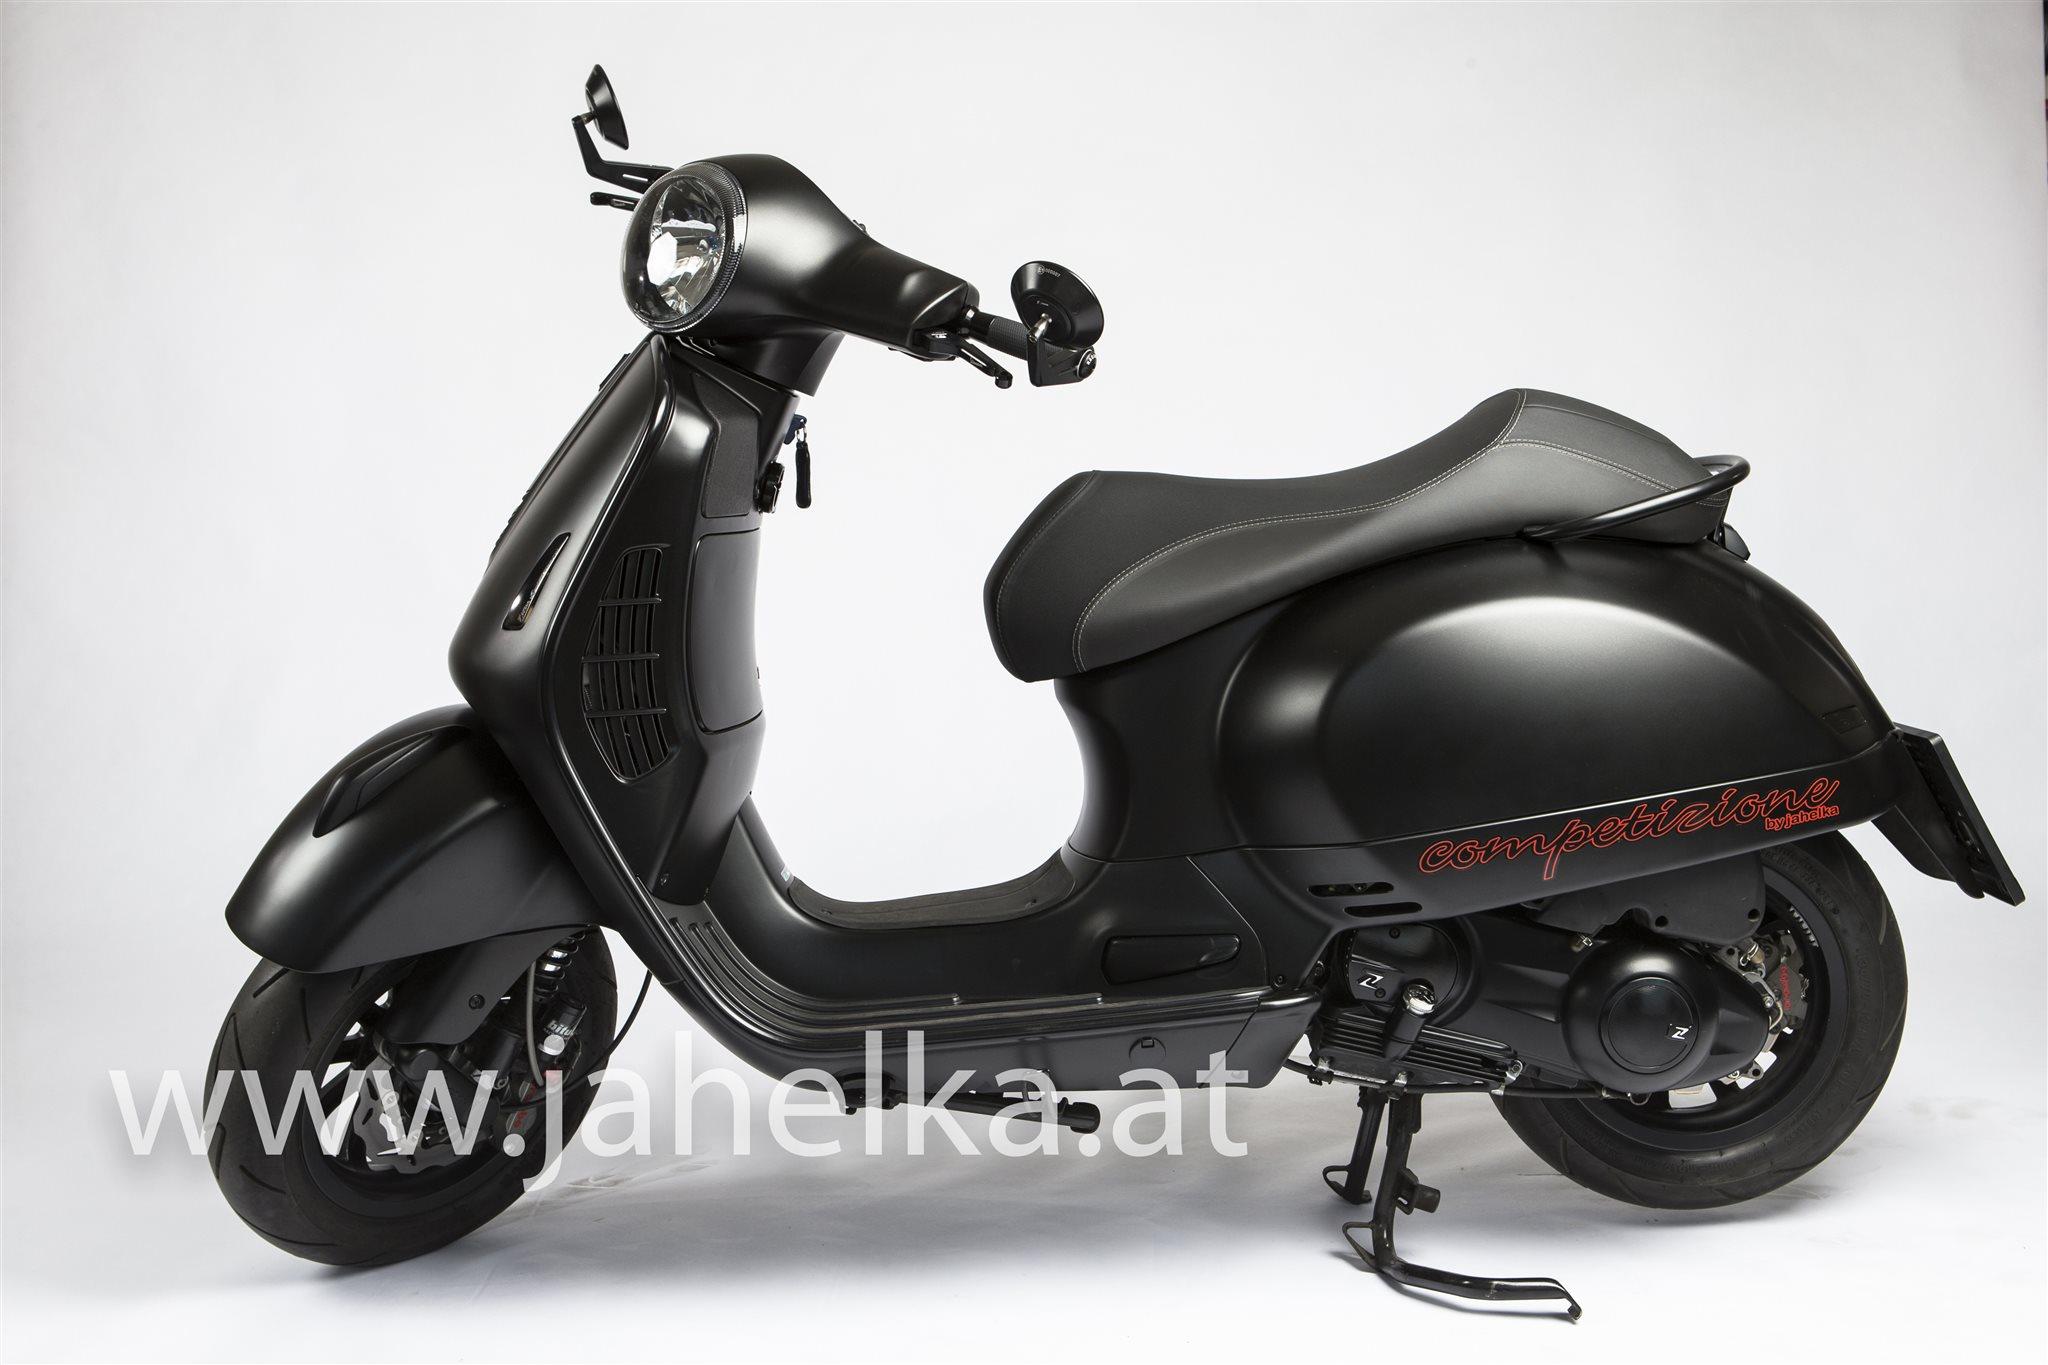 details zum custom bike vespa gts 300 i e super sport des. Black Bedroom Furniture Sets. Home Design Ideas